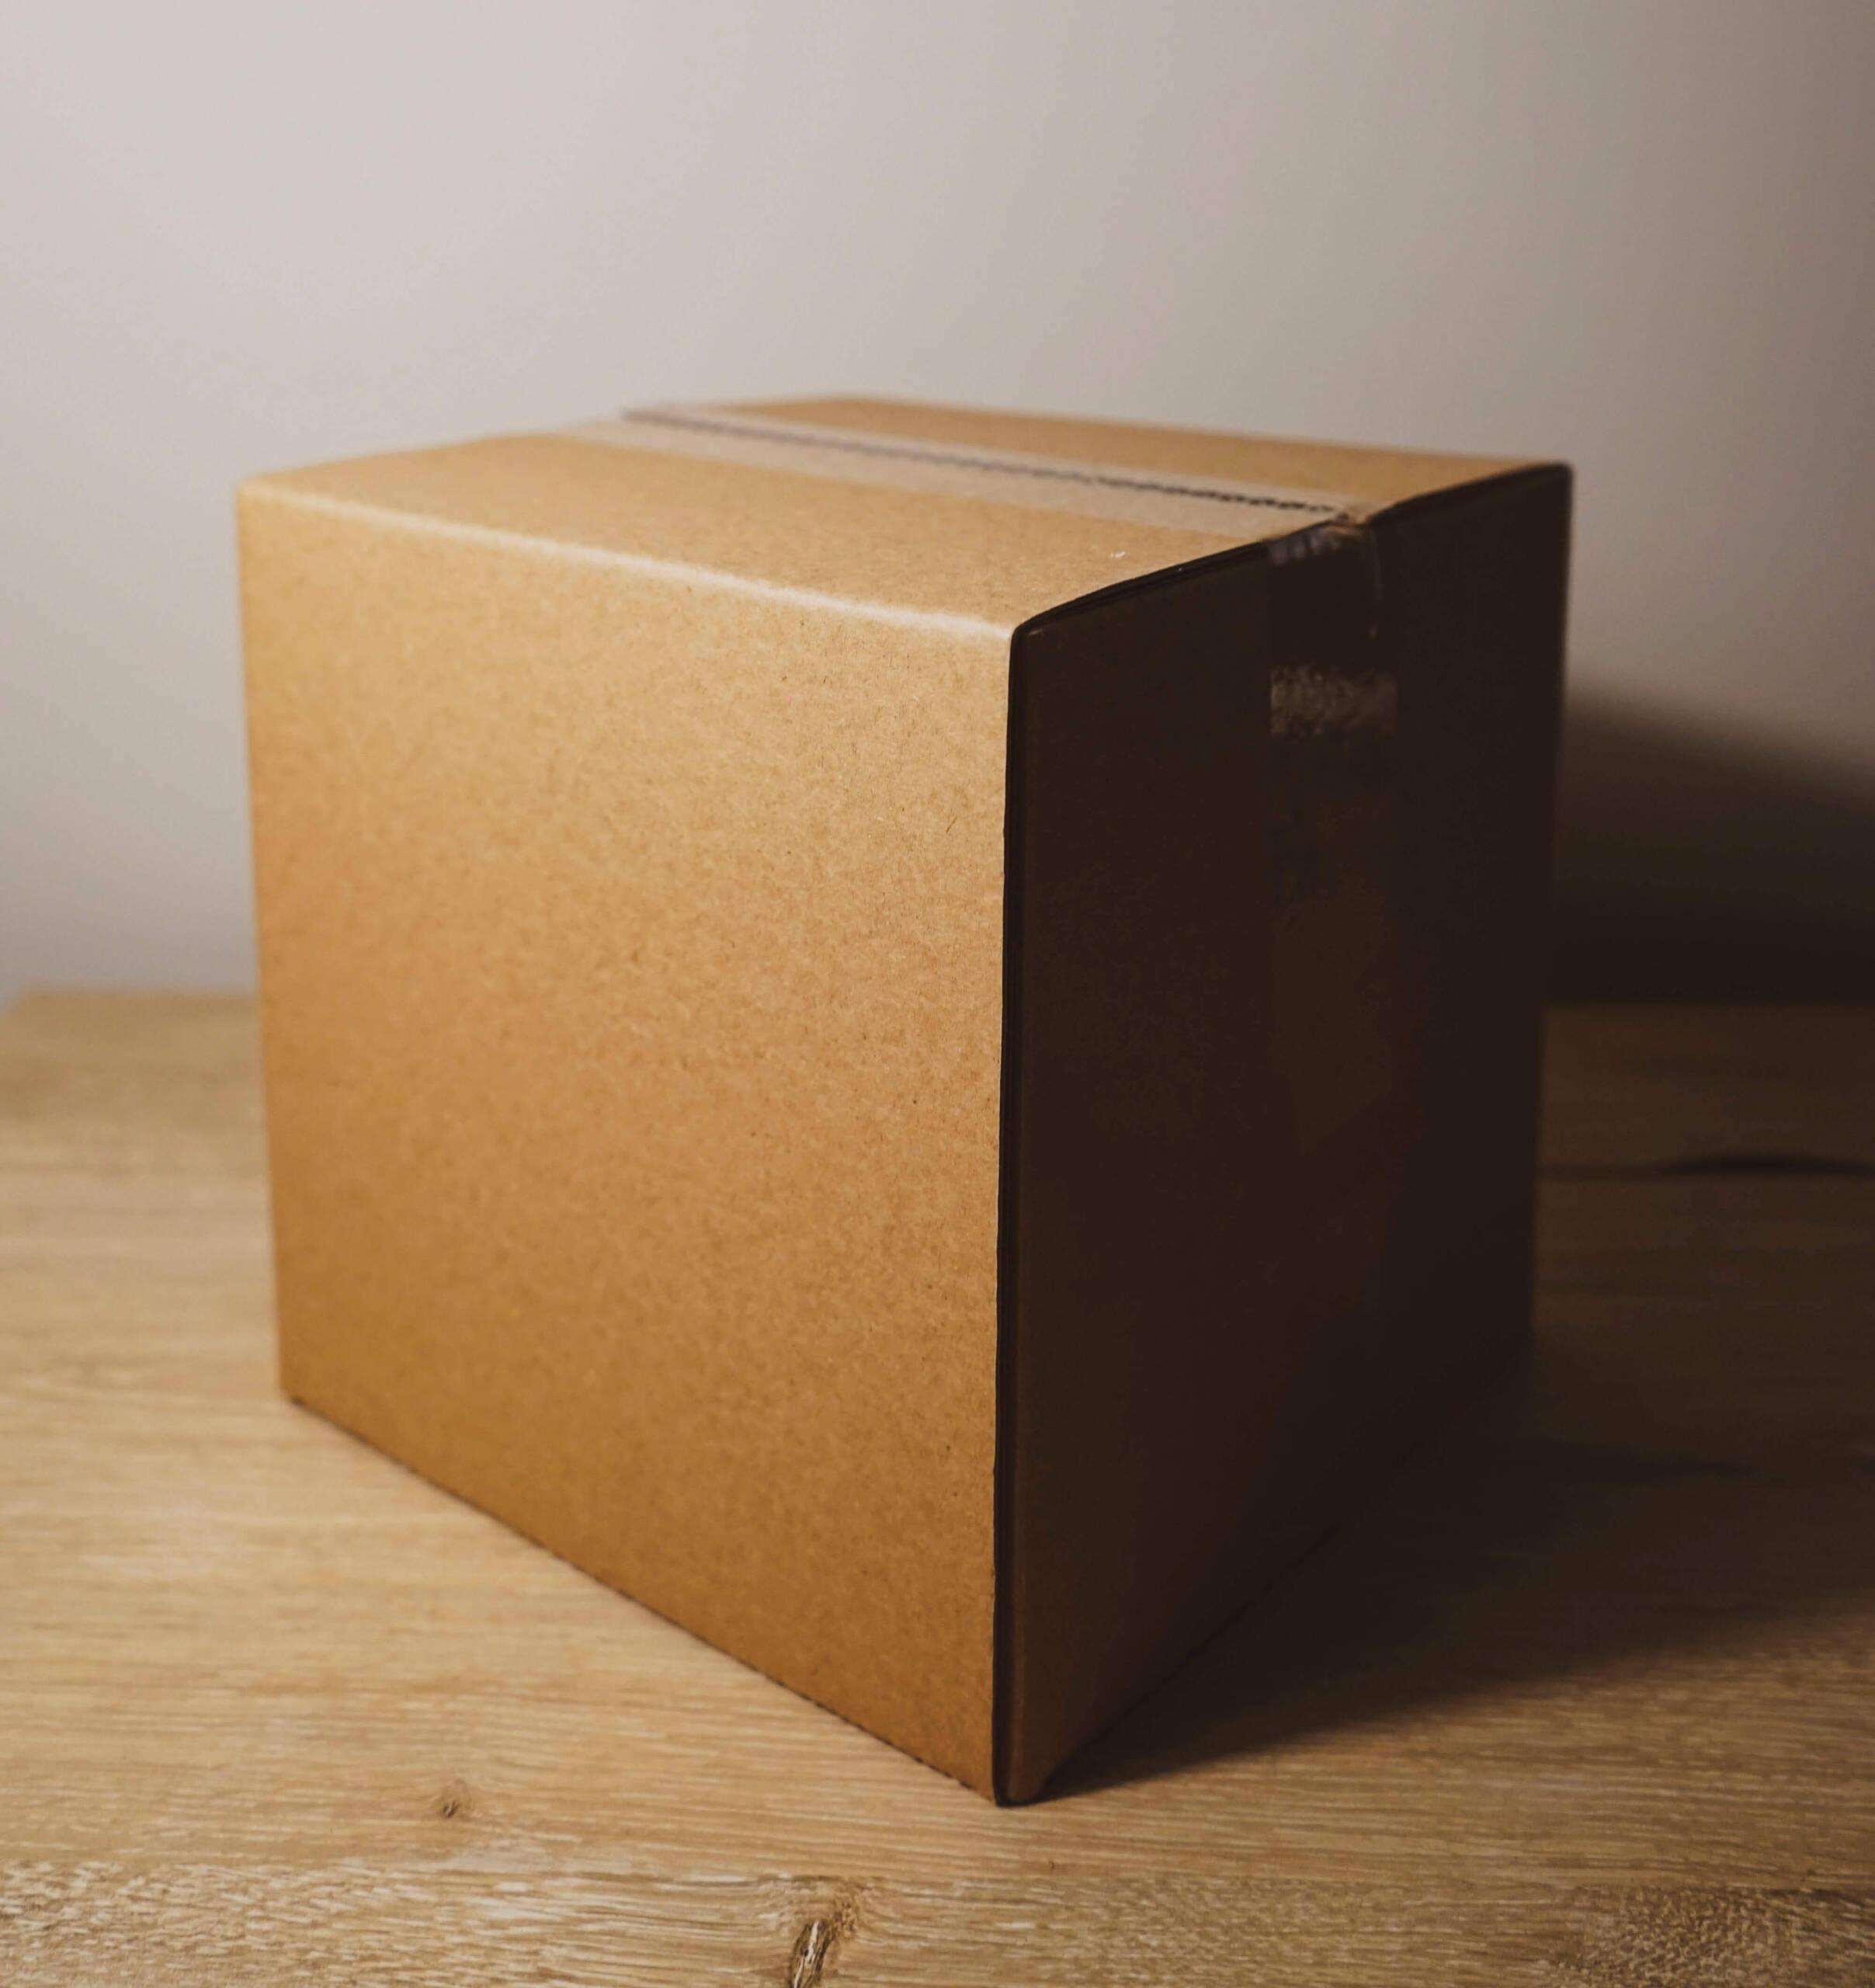 brandable box 8mCsyImZRGY unsplash1 1 scaled